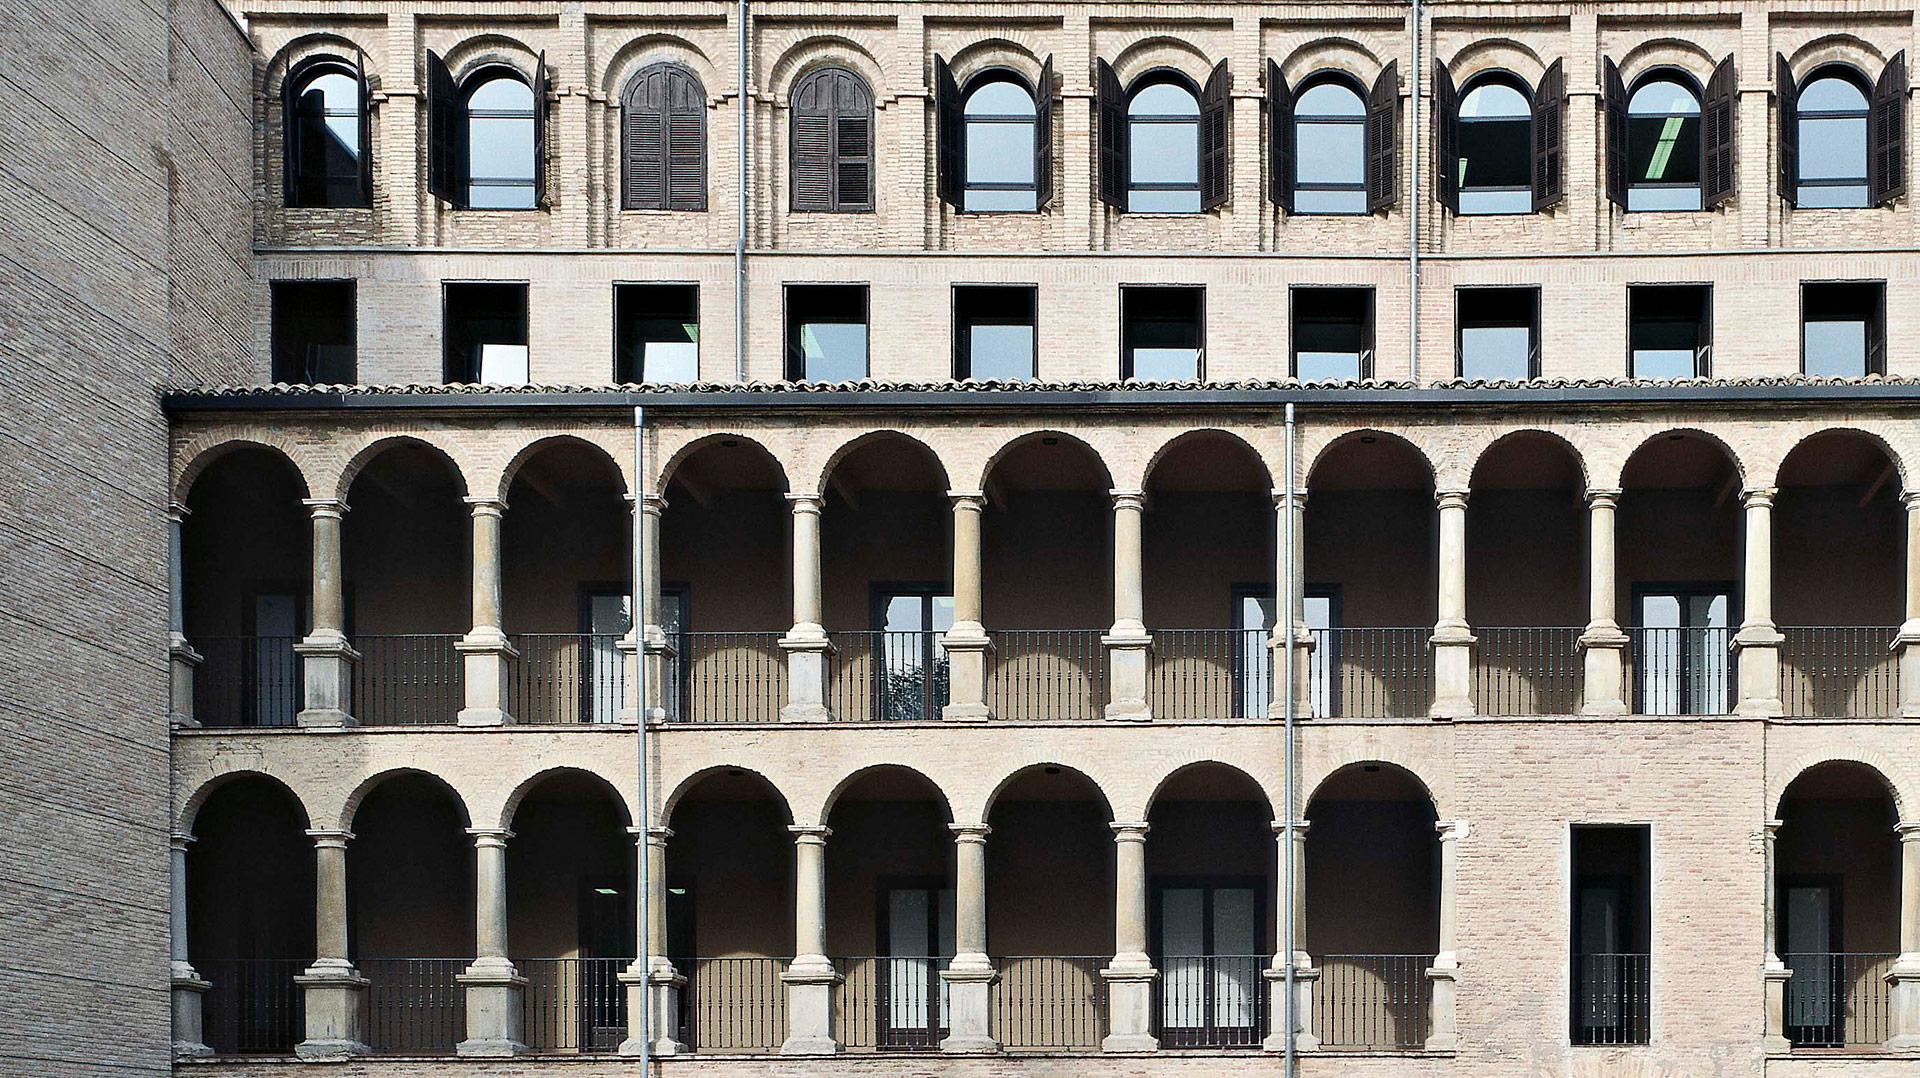 Rehabilitacion-Palacio-de-Ezpeleta-Proyecto-ByEarquitectos-Pamplona-Navarra-00-Portada